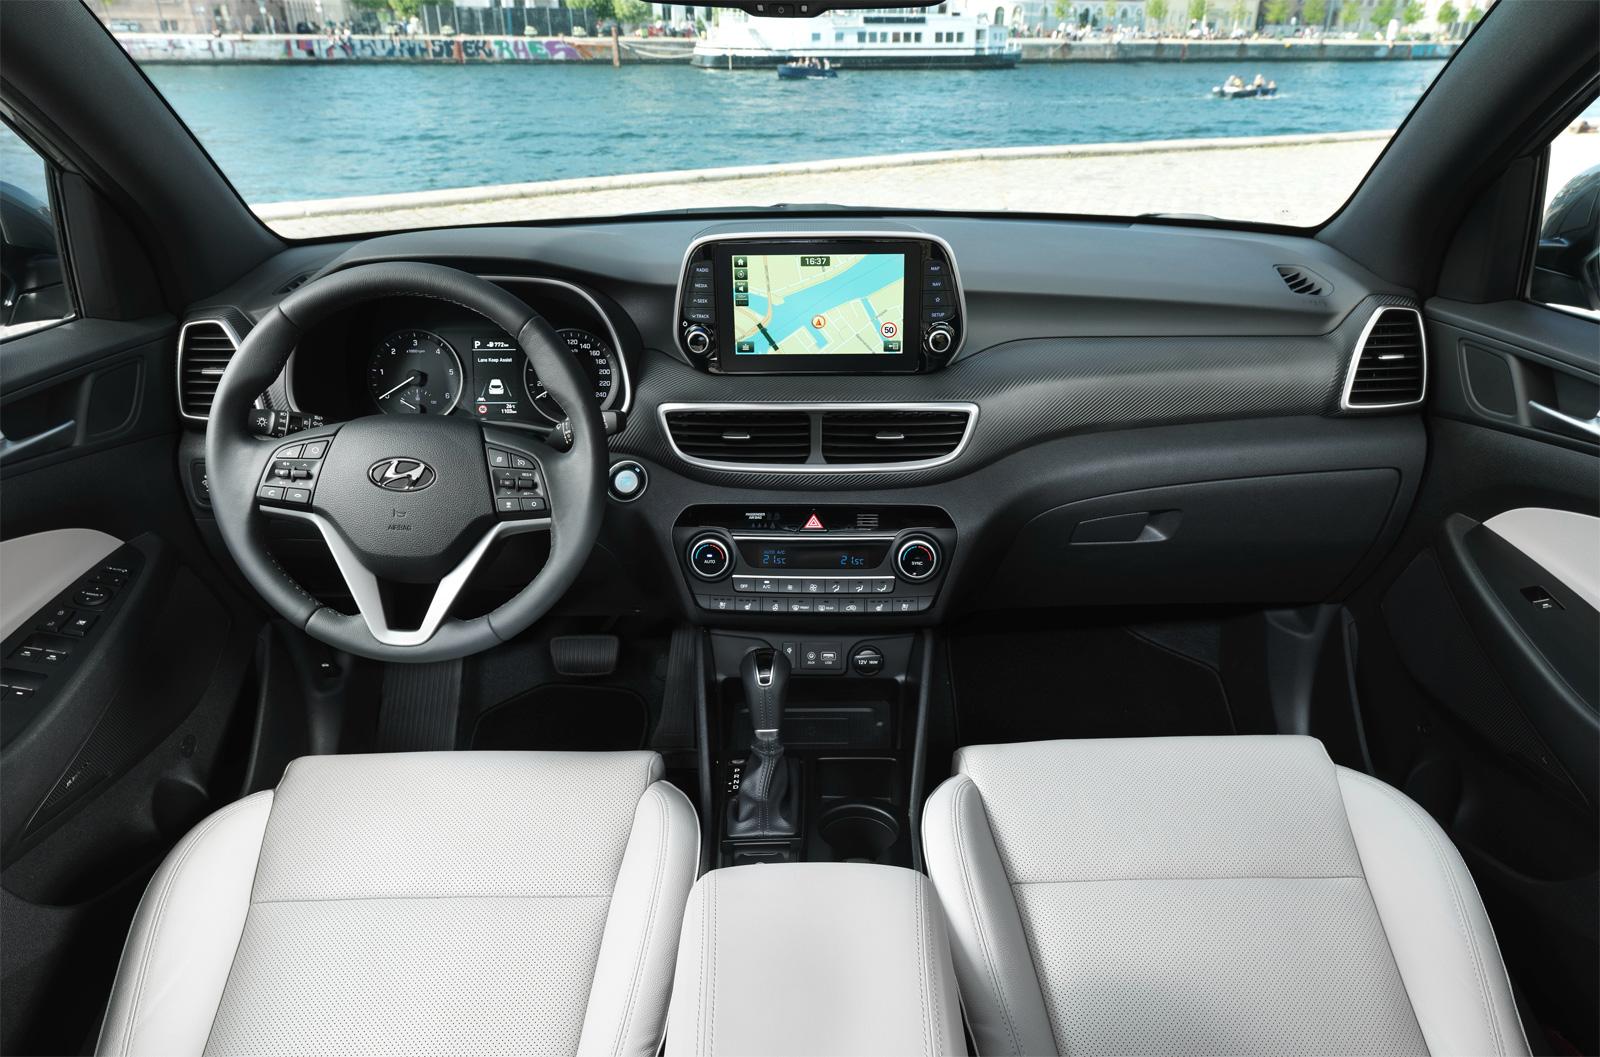 Hyundai Tucson 3 (2020-2021) цена и характеристики, фотографии и обзор